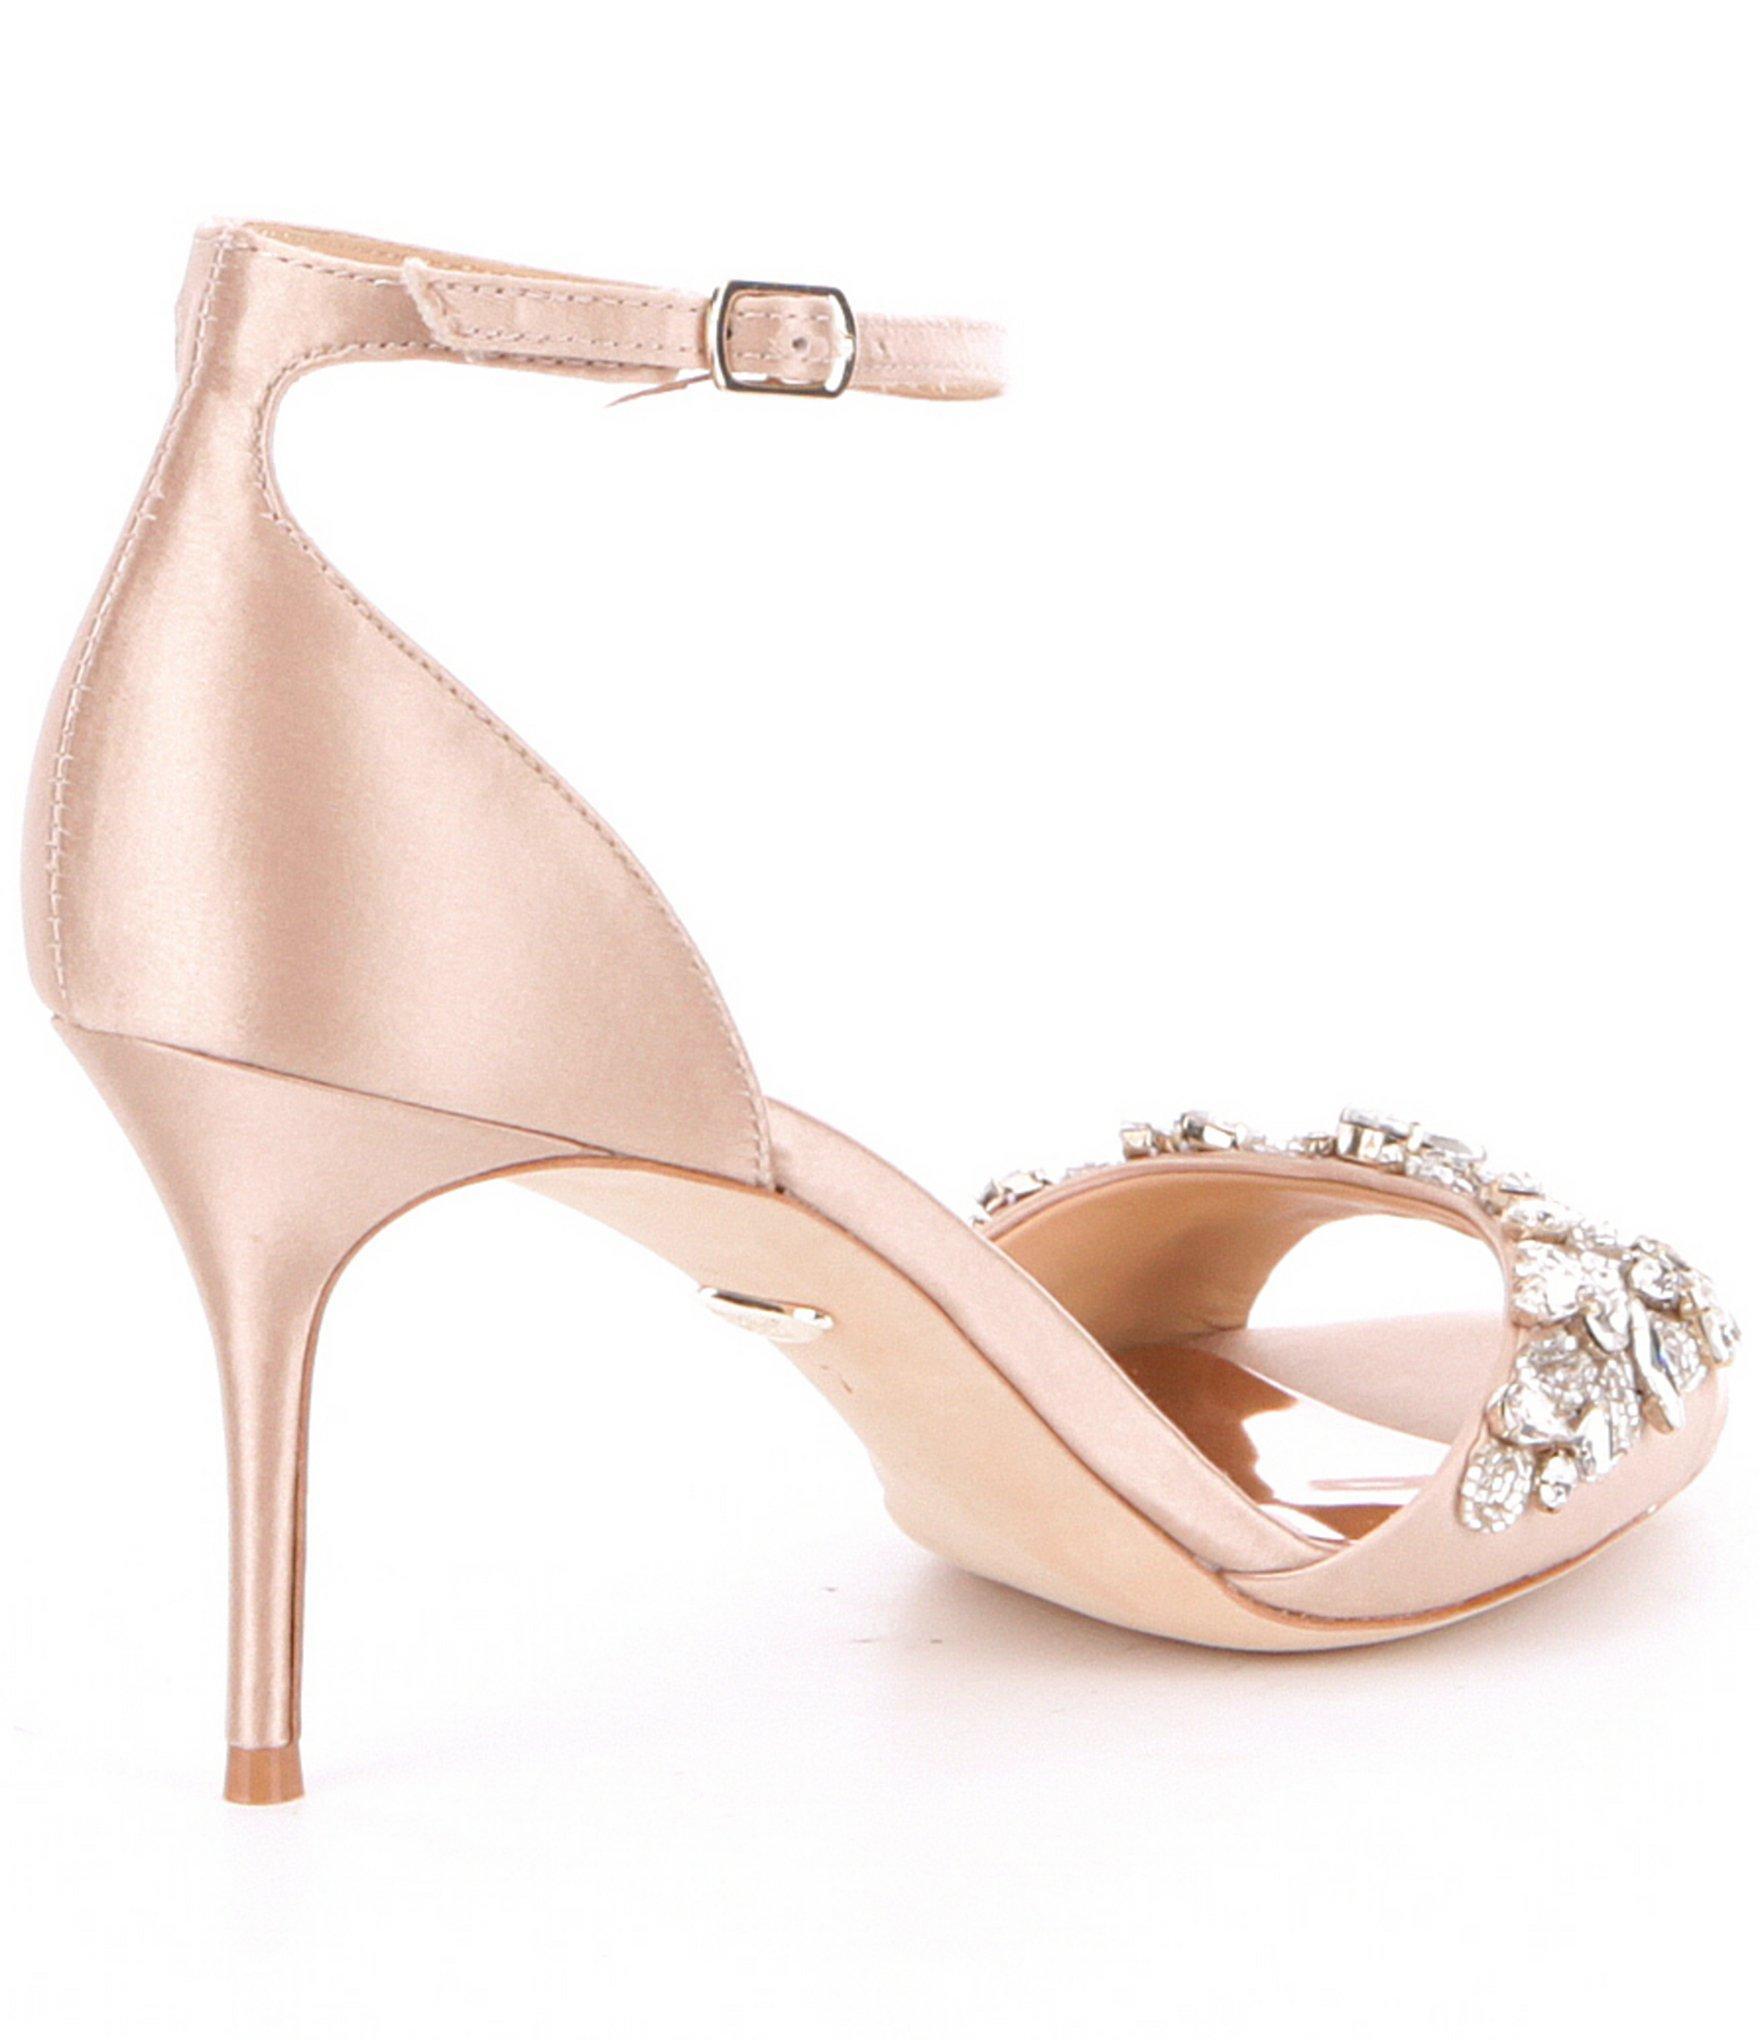 f6800d72d94 Lyst - Badgley Mischka Bankston Jeweled Satin Ankle Strap Dress ...